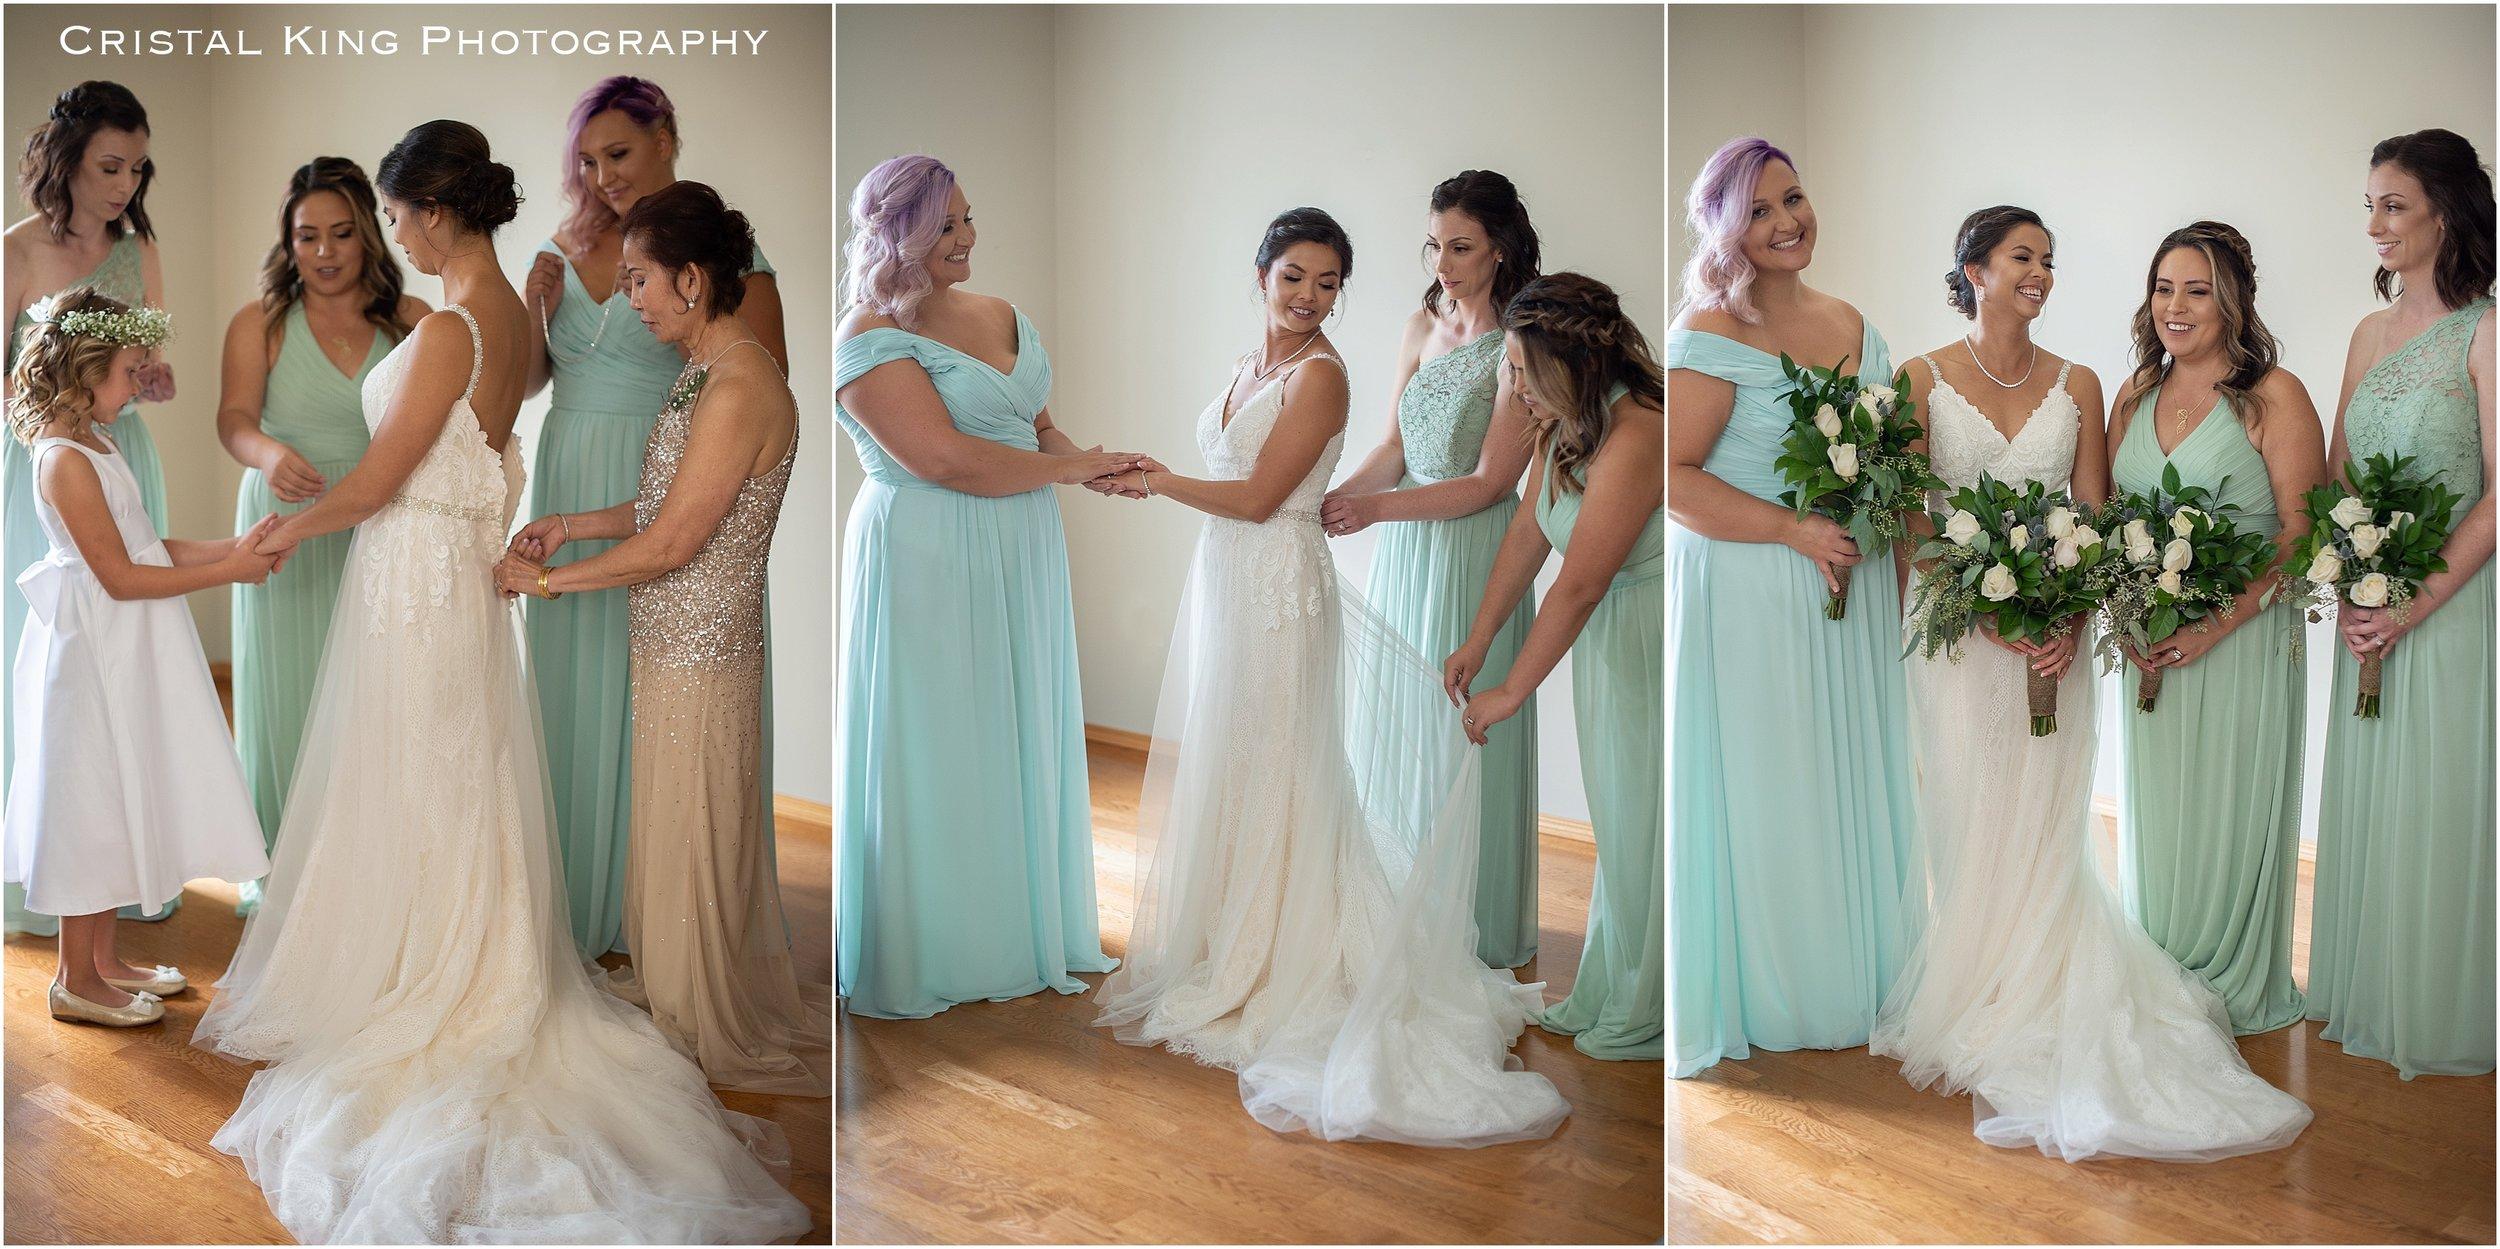 Quynh-Scotts-Wedding-28.jpg